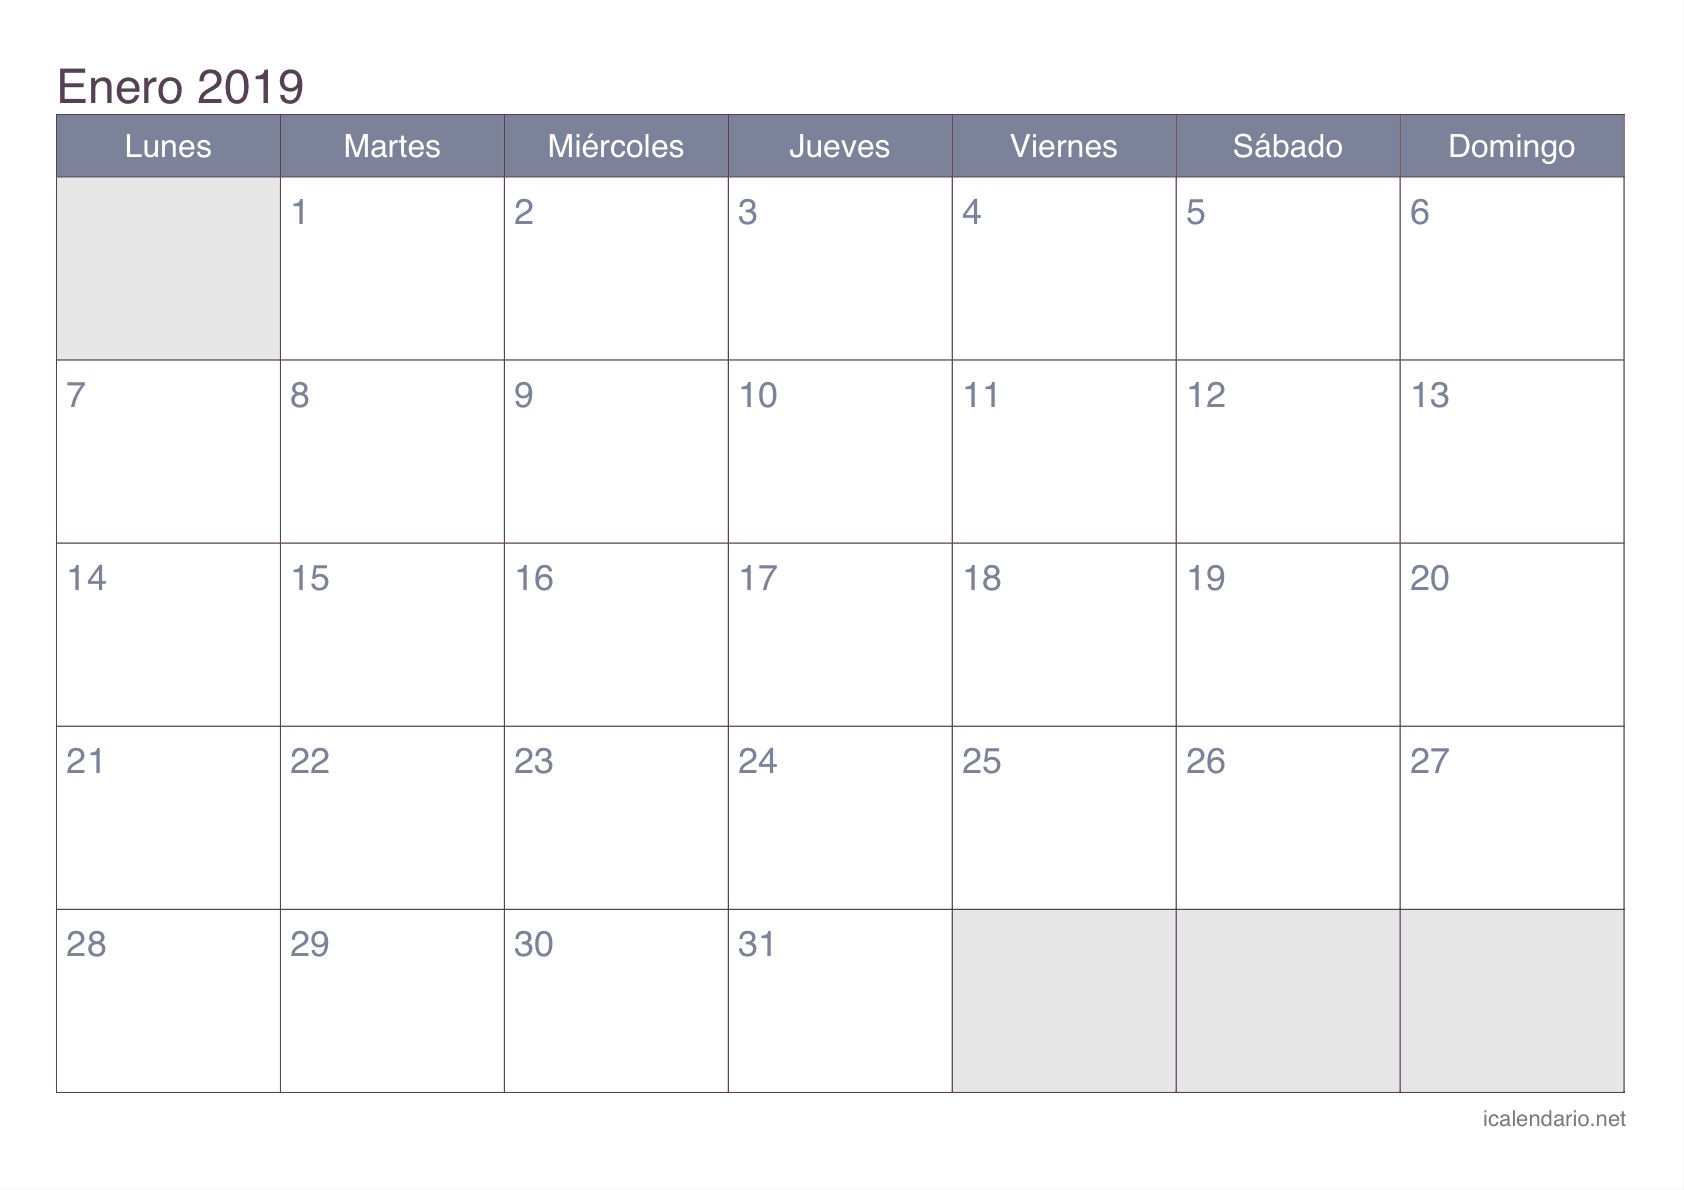 Calendario enero 2019 para imprimir iCalendario net